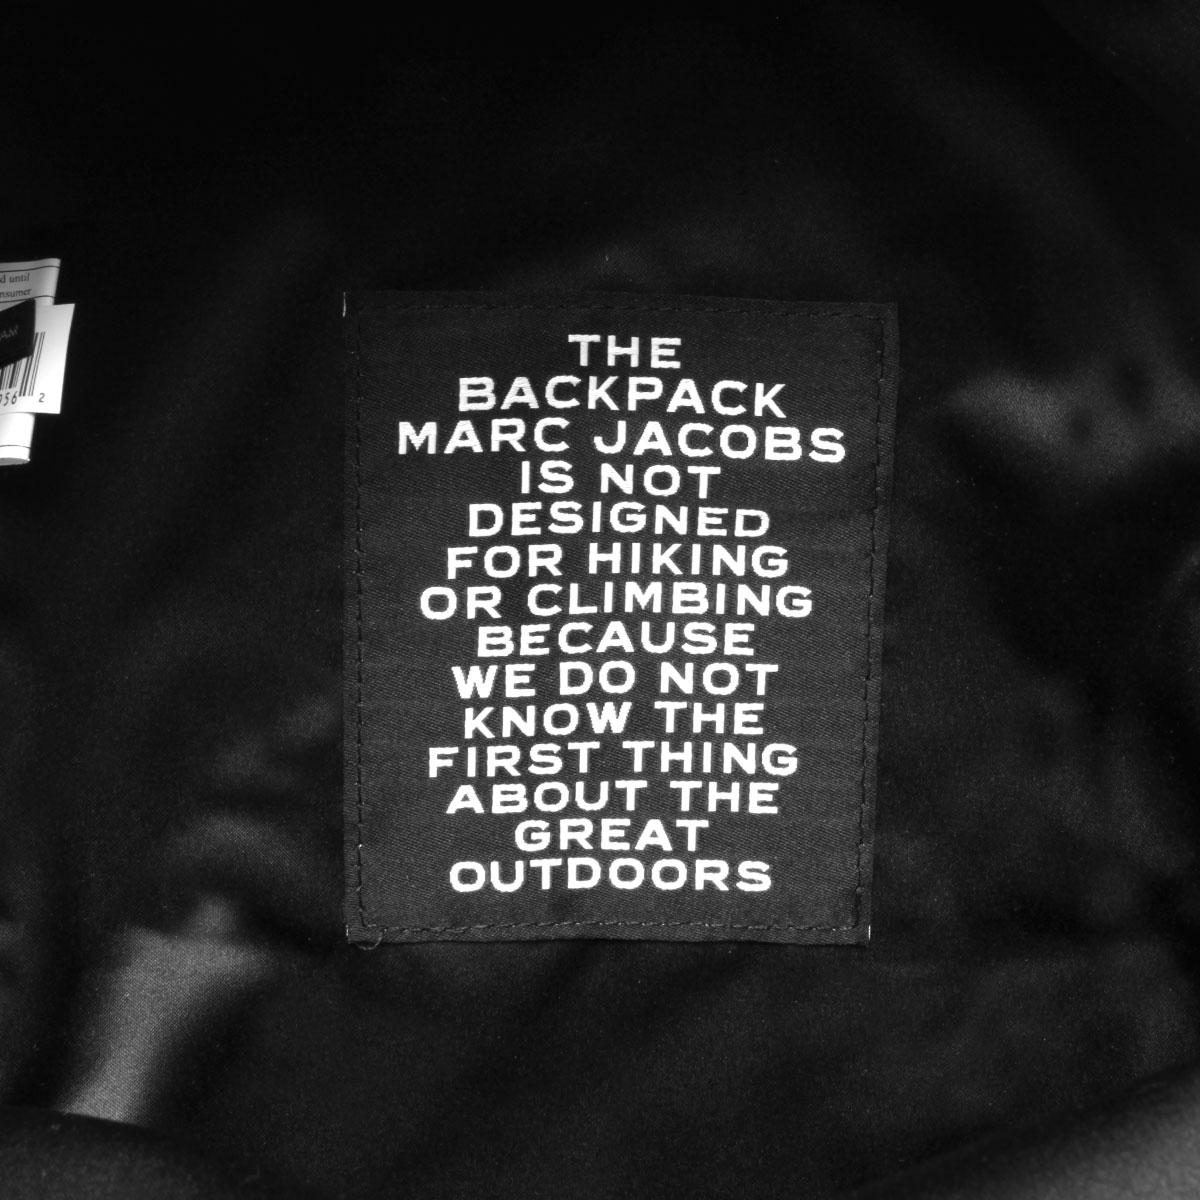 MARC JACOBS マーク ジェイコブス | バックパック ミディアム | THE DTM ザ ディーティーエム